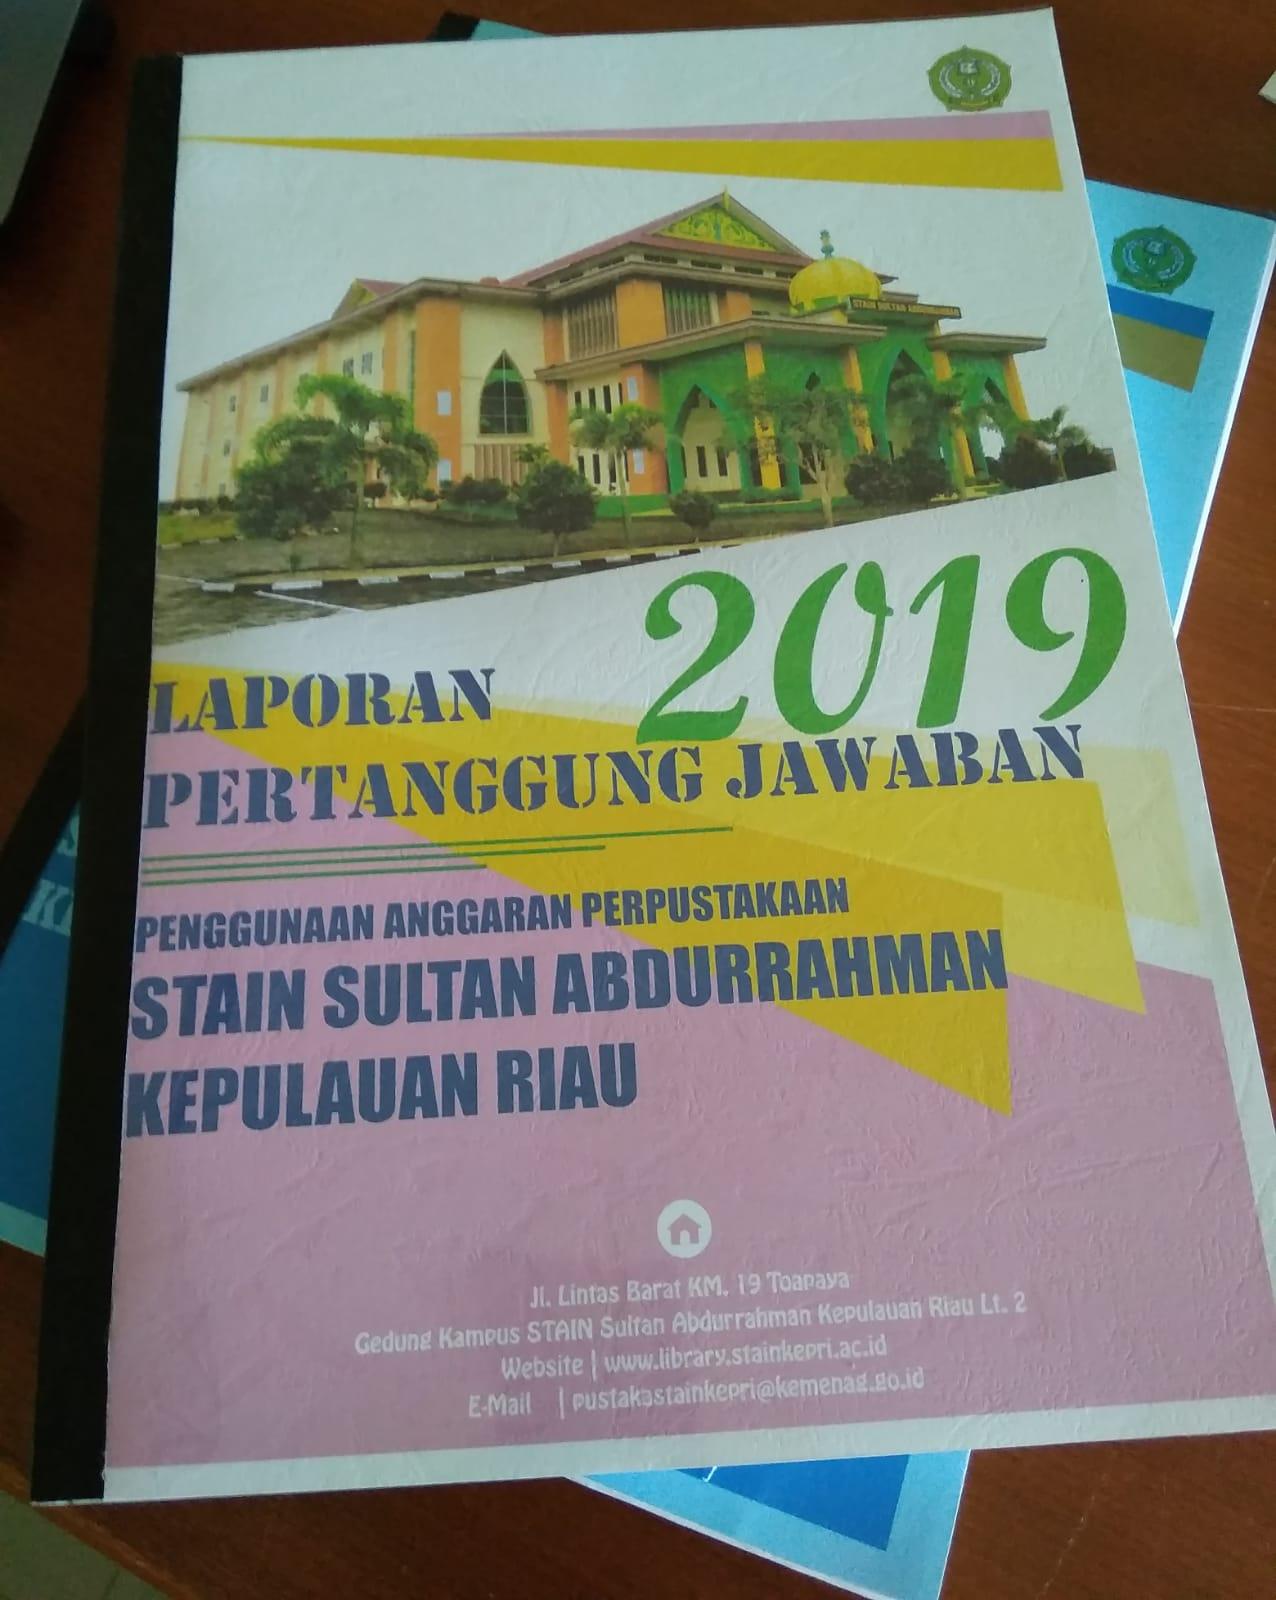 Laporan Pertanggung Jawaban Penggunaan Anggaran 2019